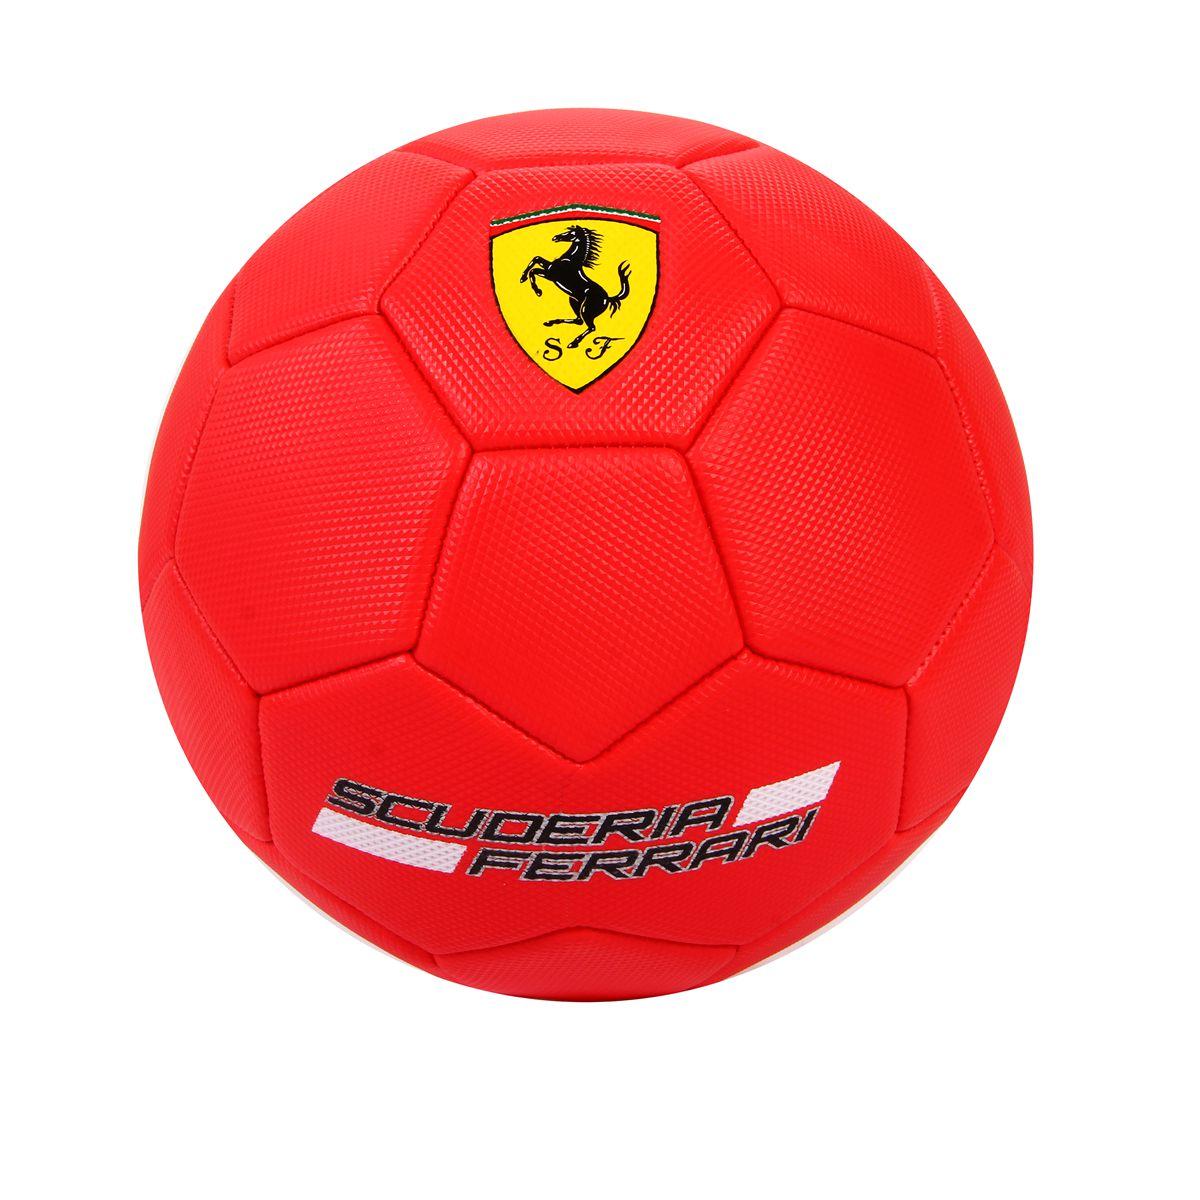 Official Match Football Soccer Ball Size 5 PVC Club Team Training ... 7b070a1affe